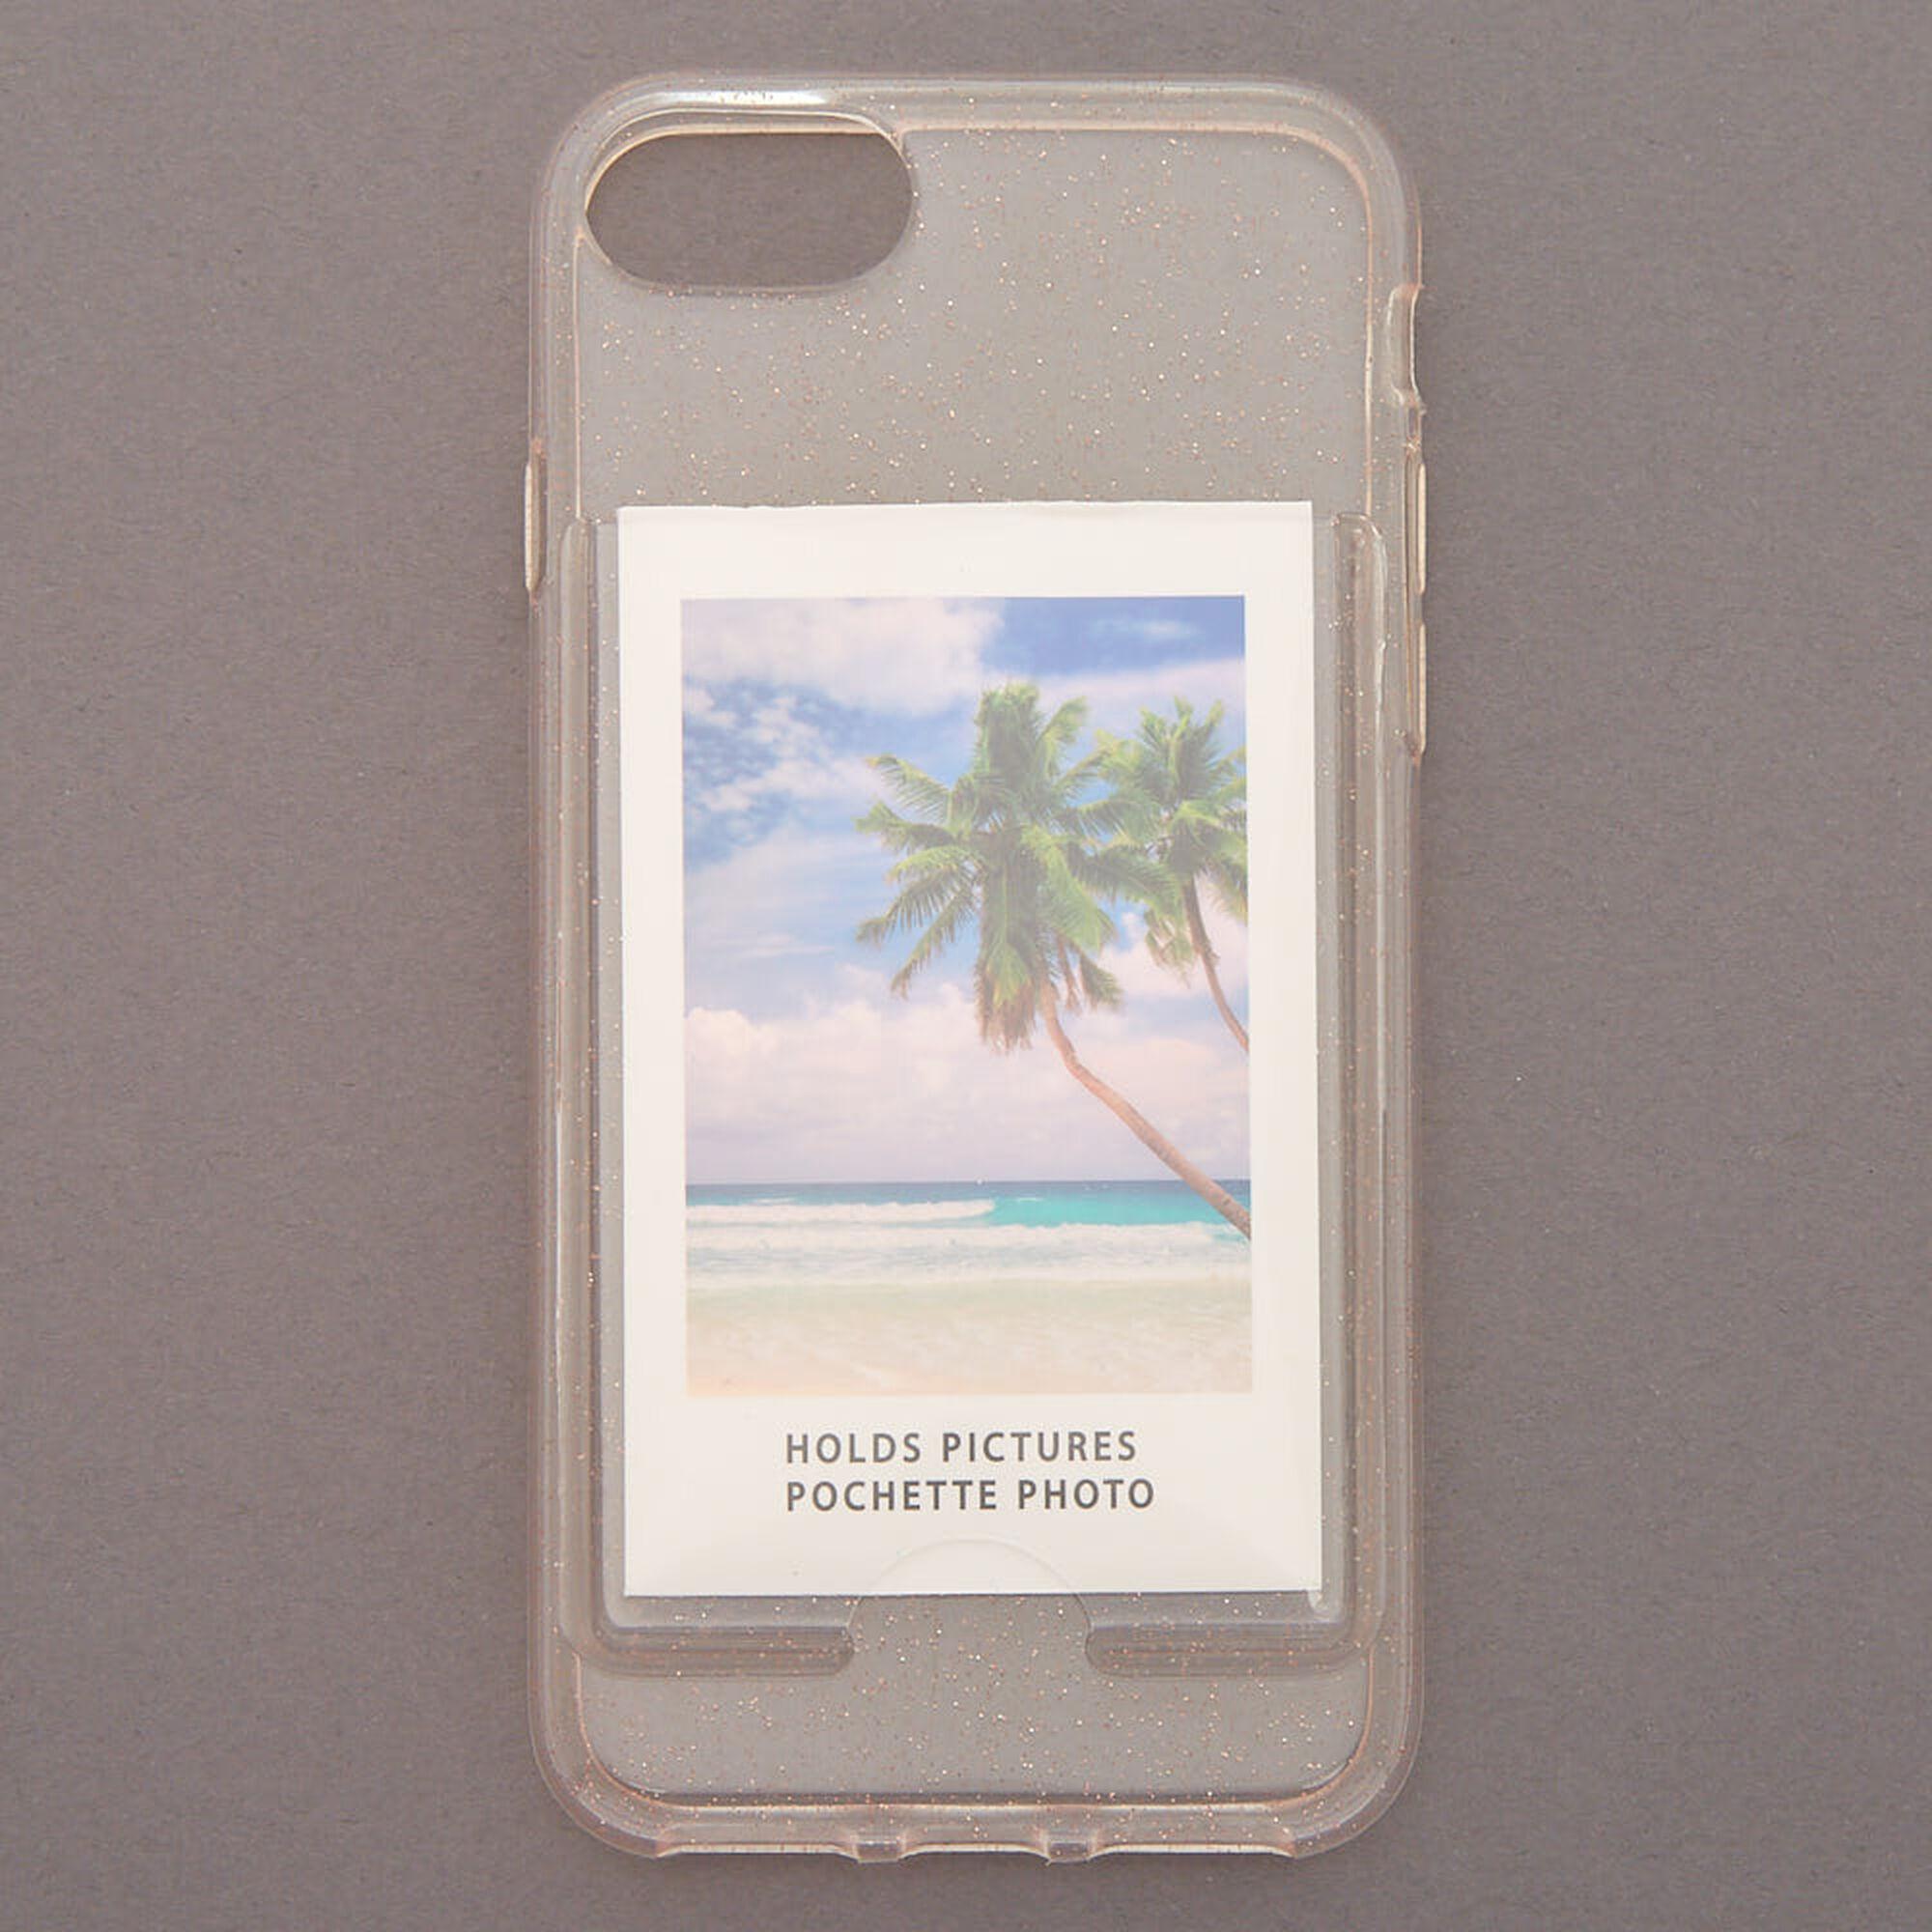 sale retailer 0e83c c351e Instax Mini Pocket Glitter Phone Case - Fits iPhone 6/7/8